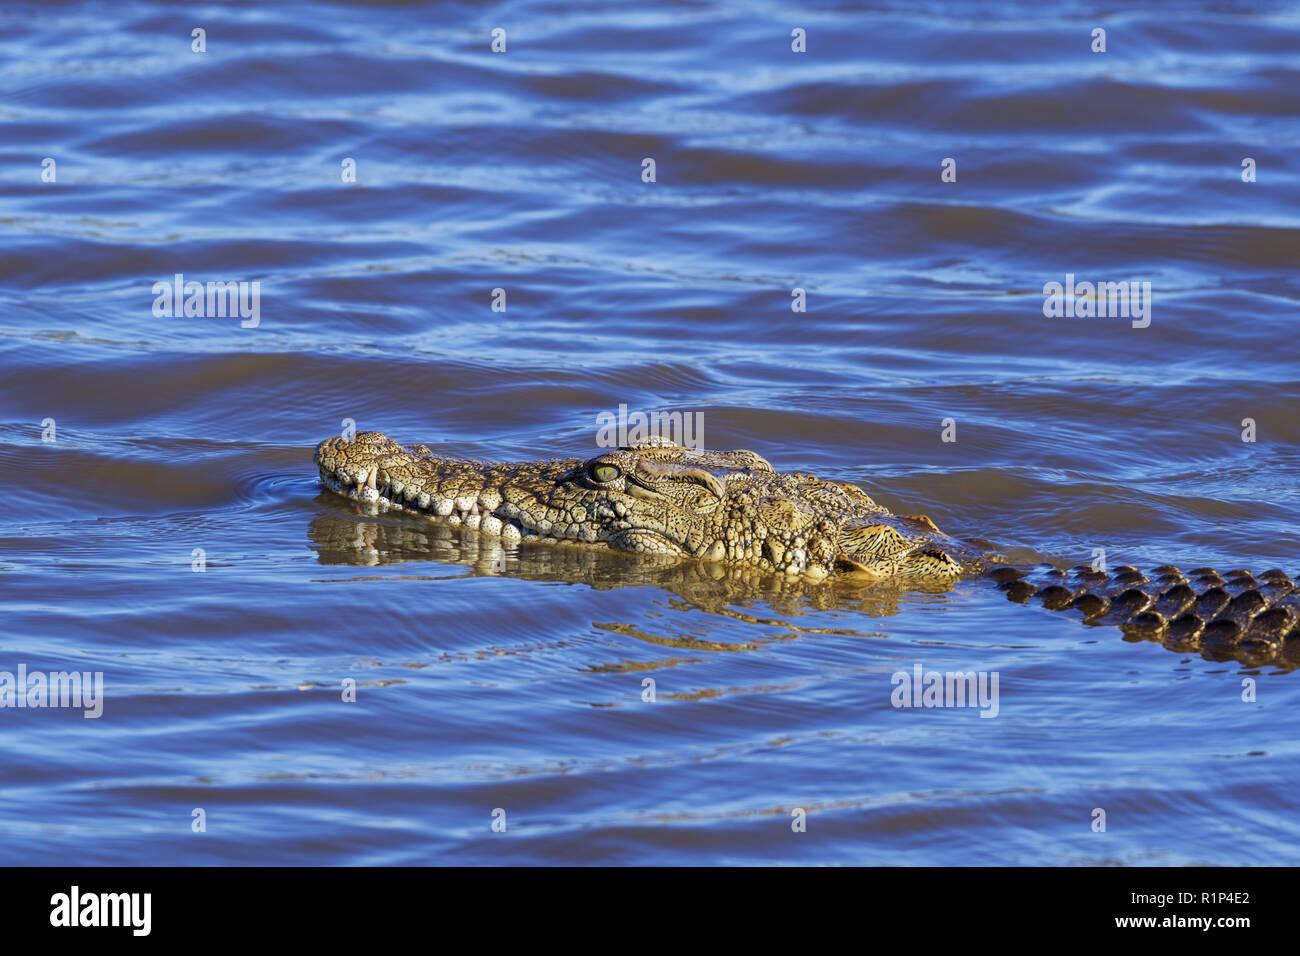 Nile crocodile (Crocodylus niloticus) in water, Sunset Dam, Kruger National Park, Mpumalanga, South Africa, Africa Stock Photo